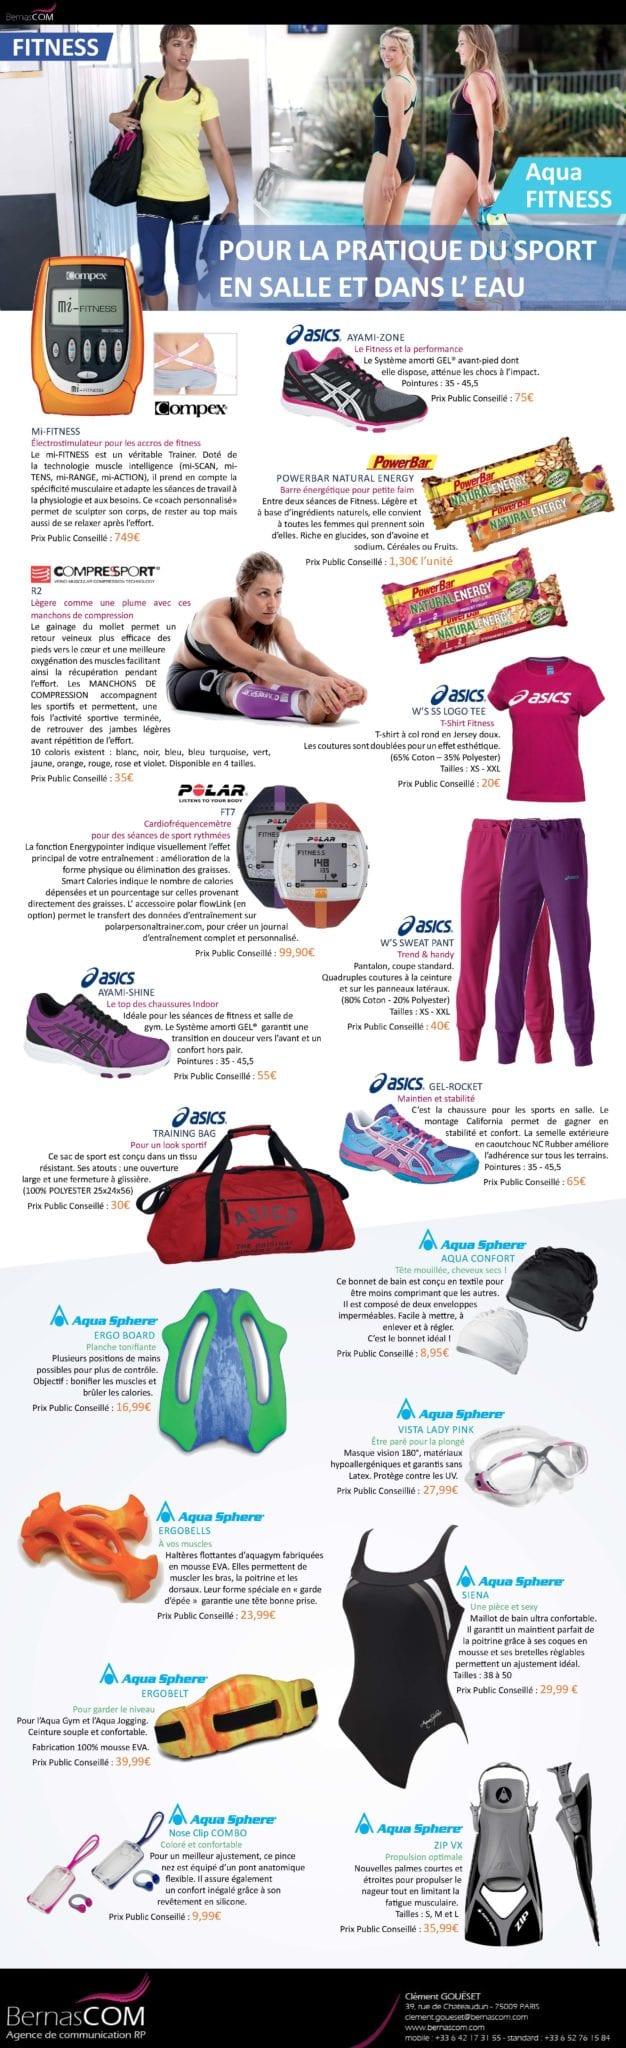 Fitness / Aqua-Fitness